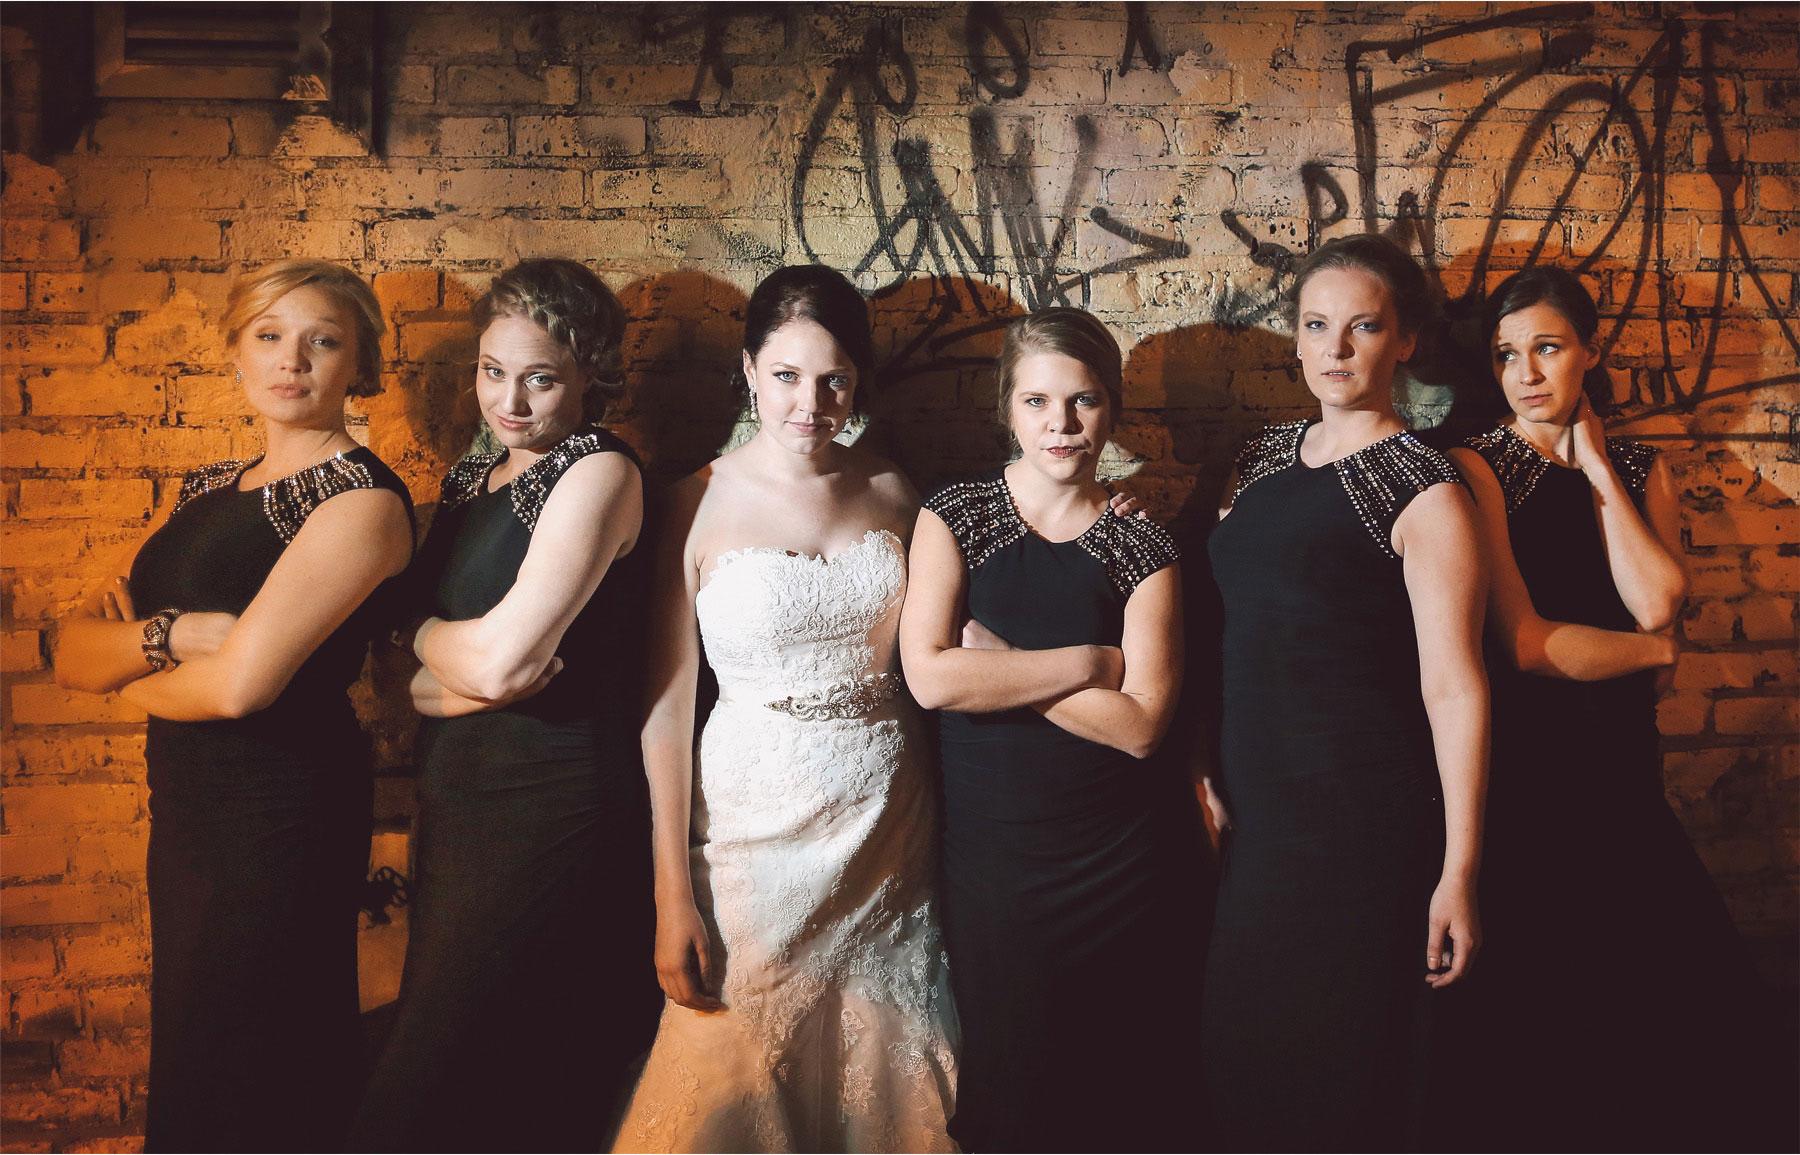 15-Minneapolis-Minnesota-Wedding-Photographer-by-Andrew-Vick-Photography-Winter-Varsity-Theater-Bride-Bridesmaids-Vintage-Sara-and-Rob.jpg